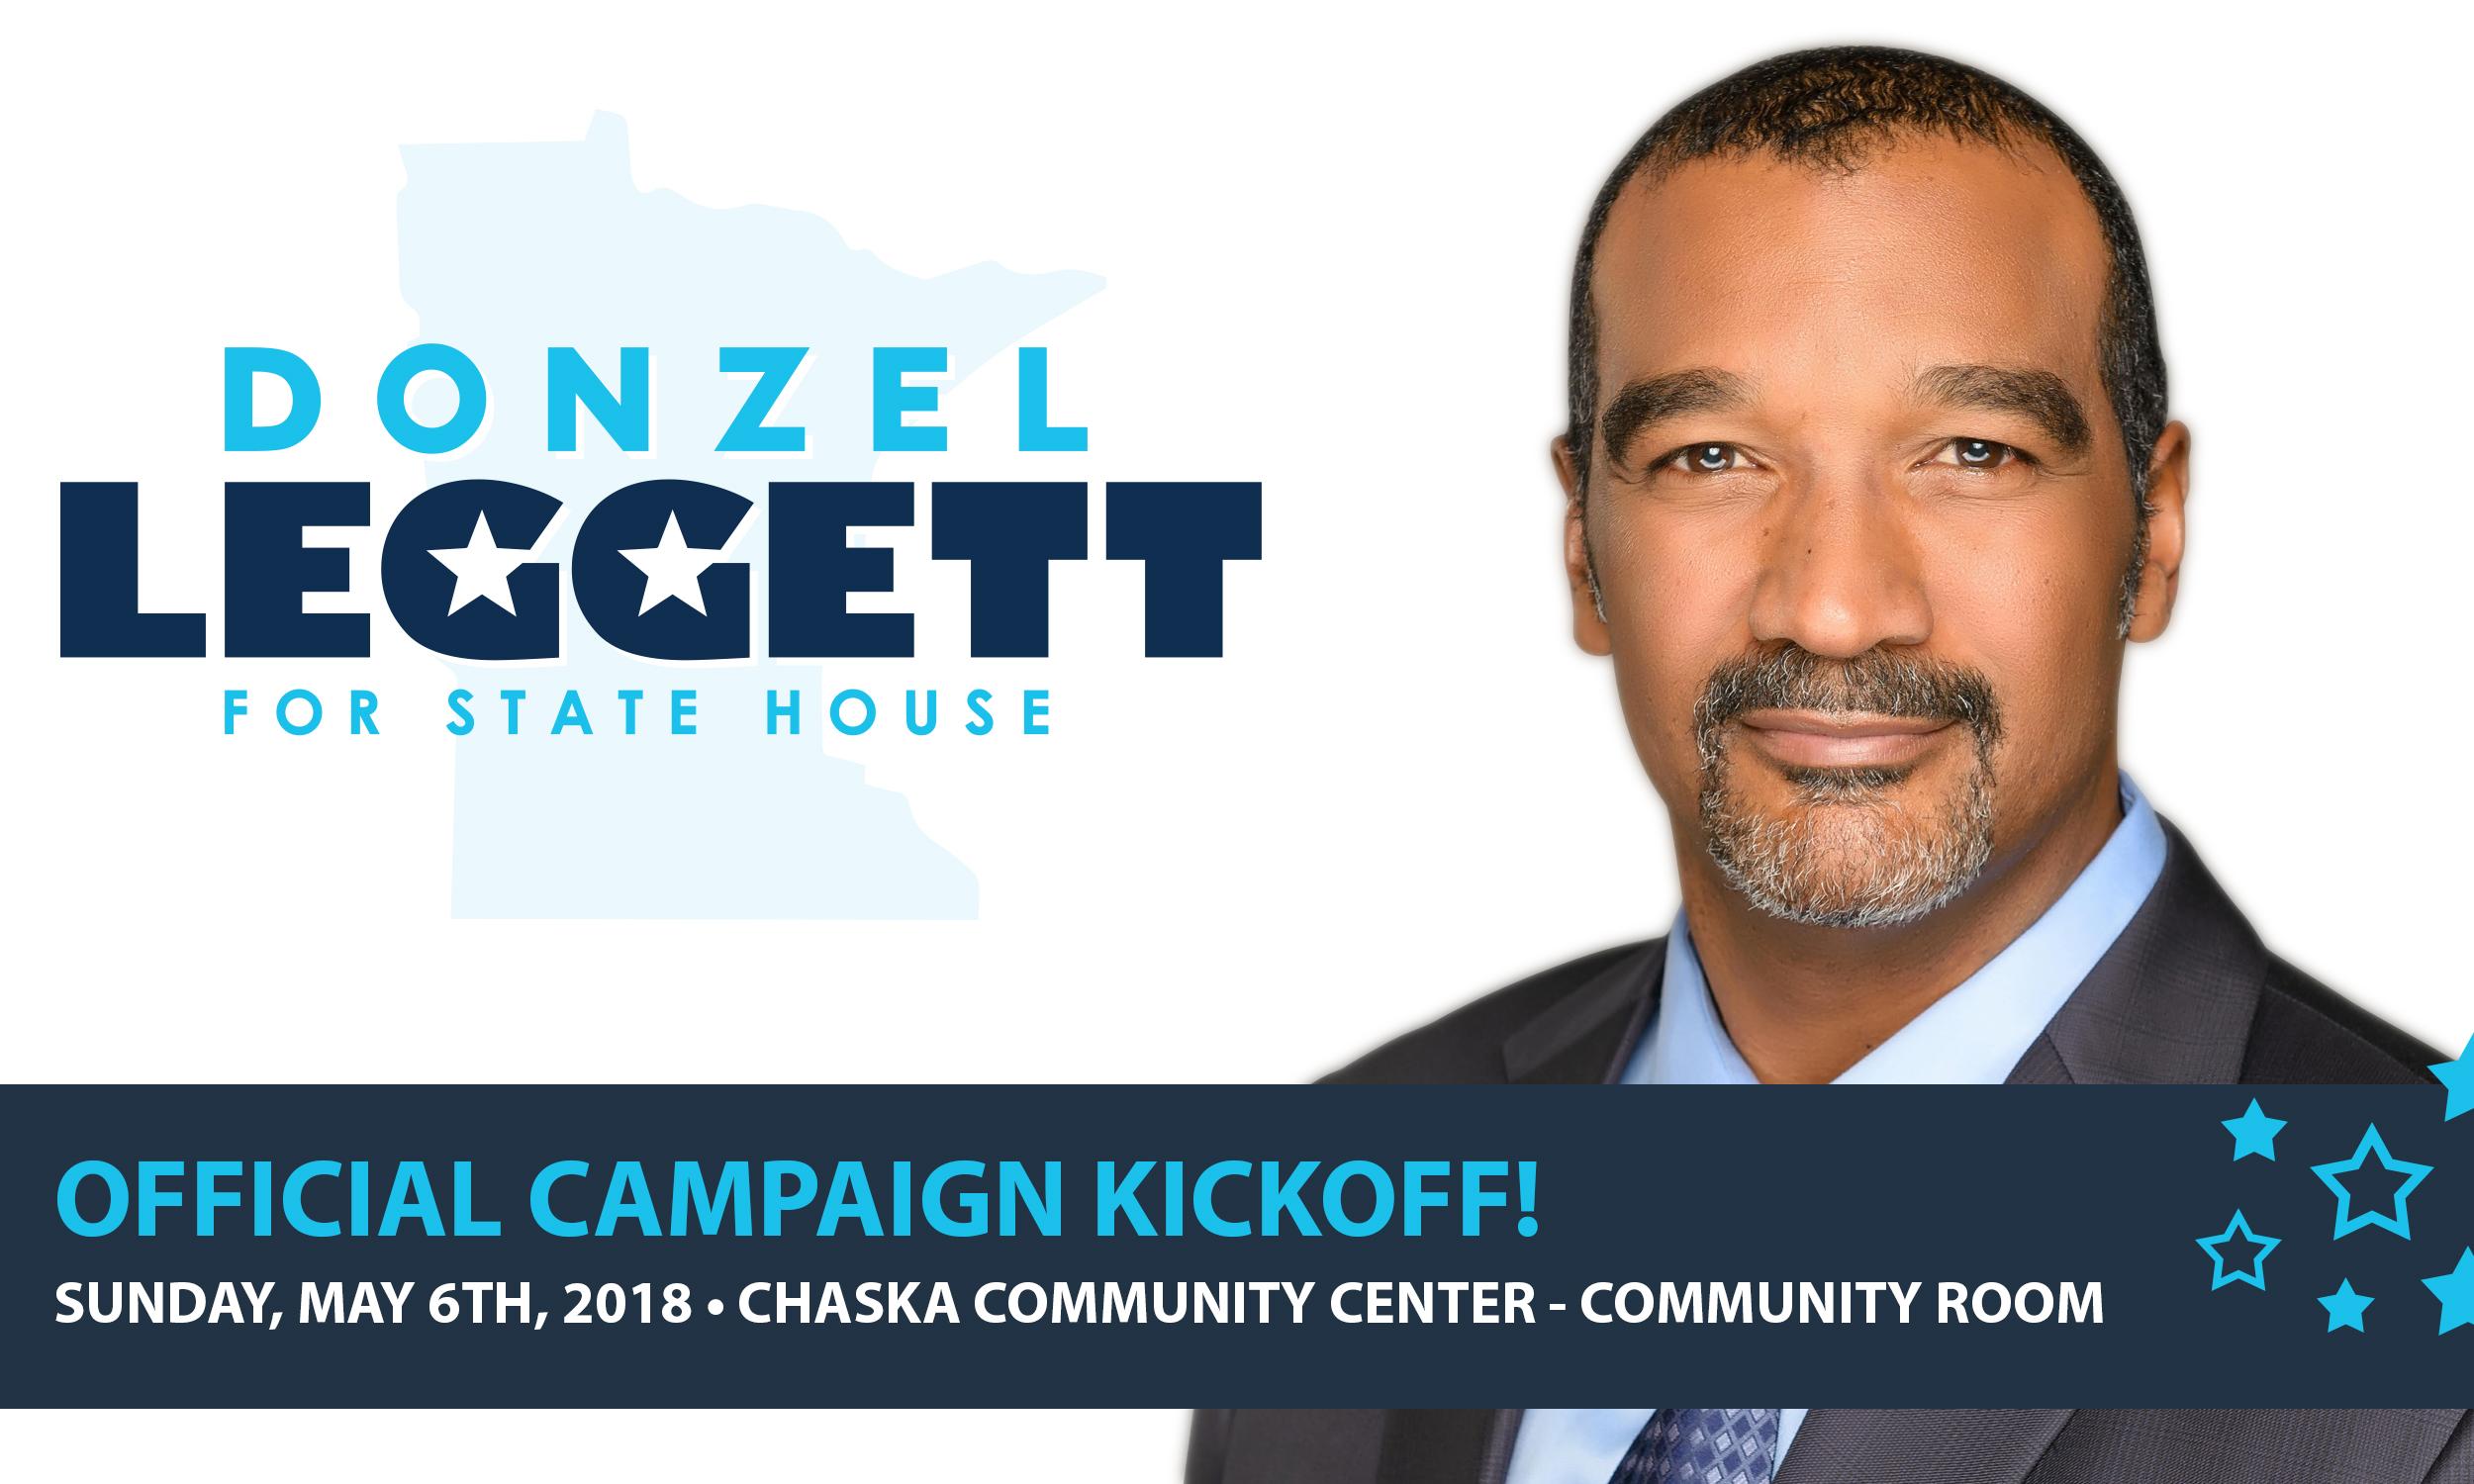 donzel_campaignKickoff.jpg